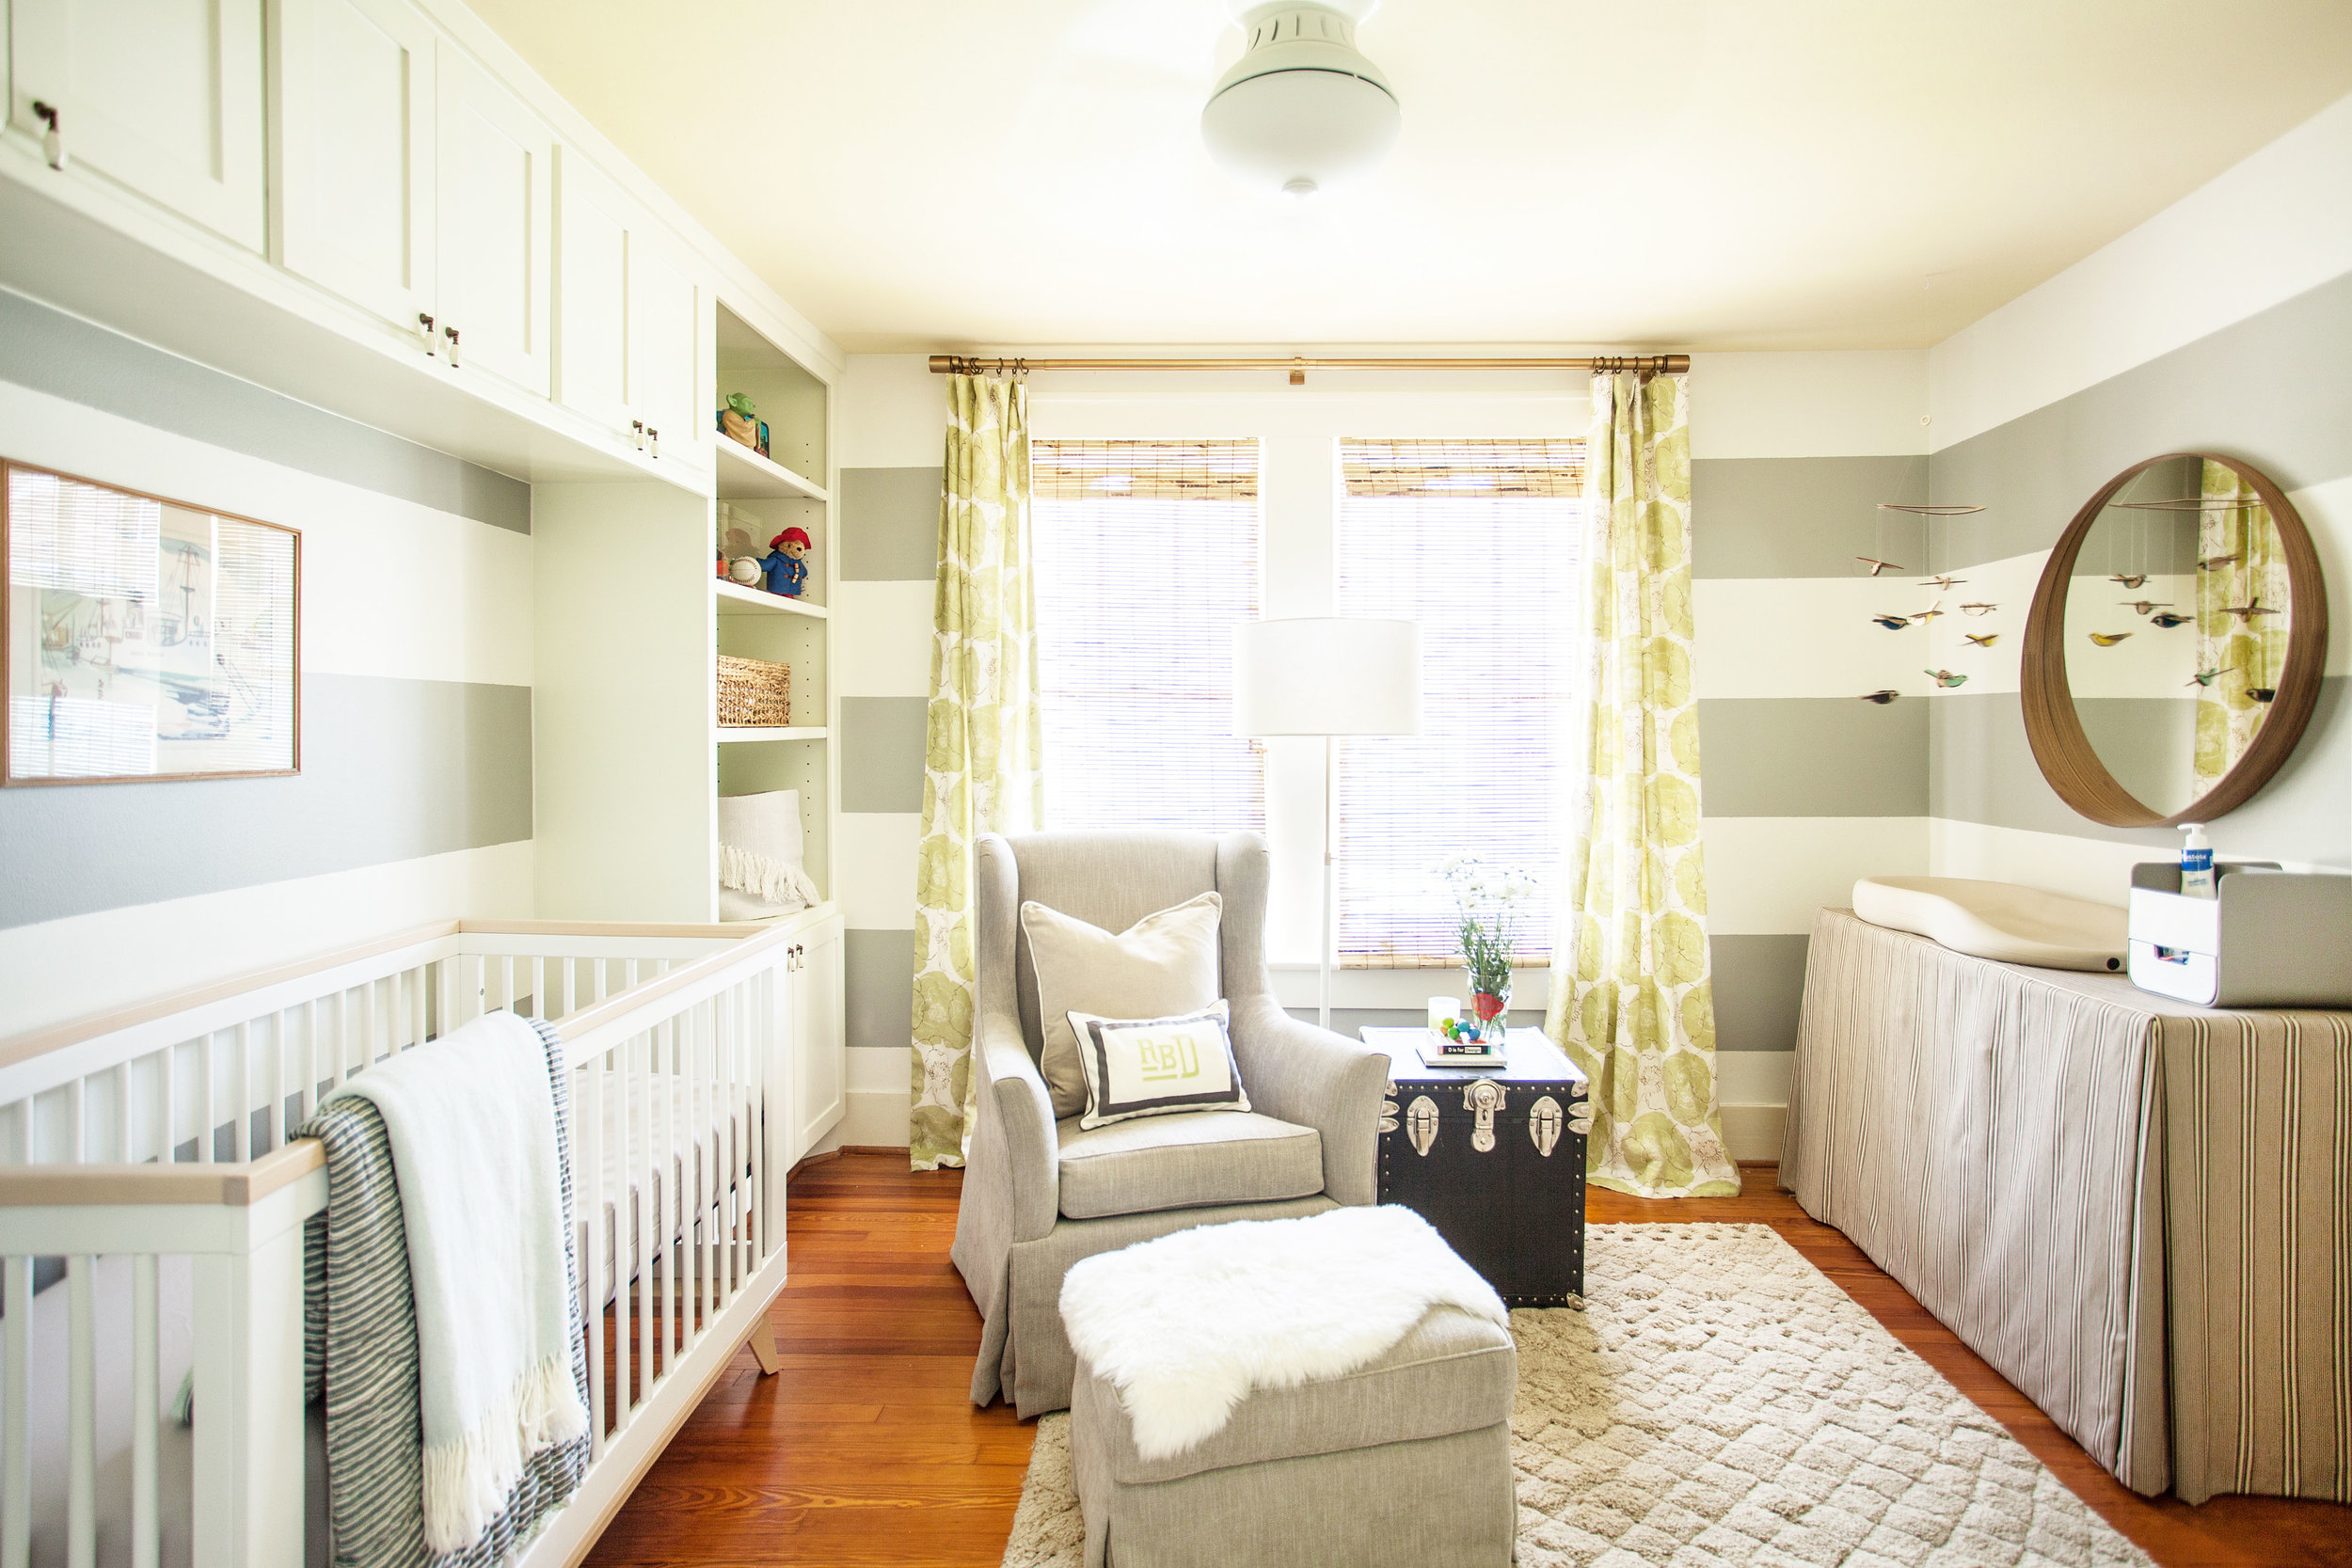 Horizontal grey striped nursery with painted ceiling by Berlin interior designer Jamie House Design